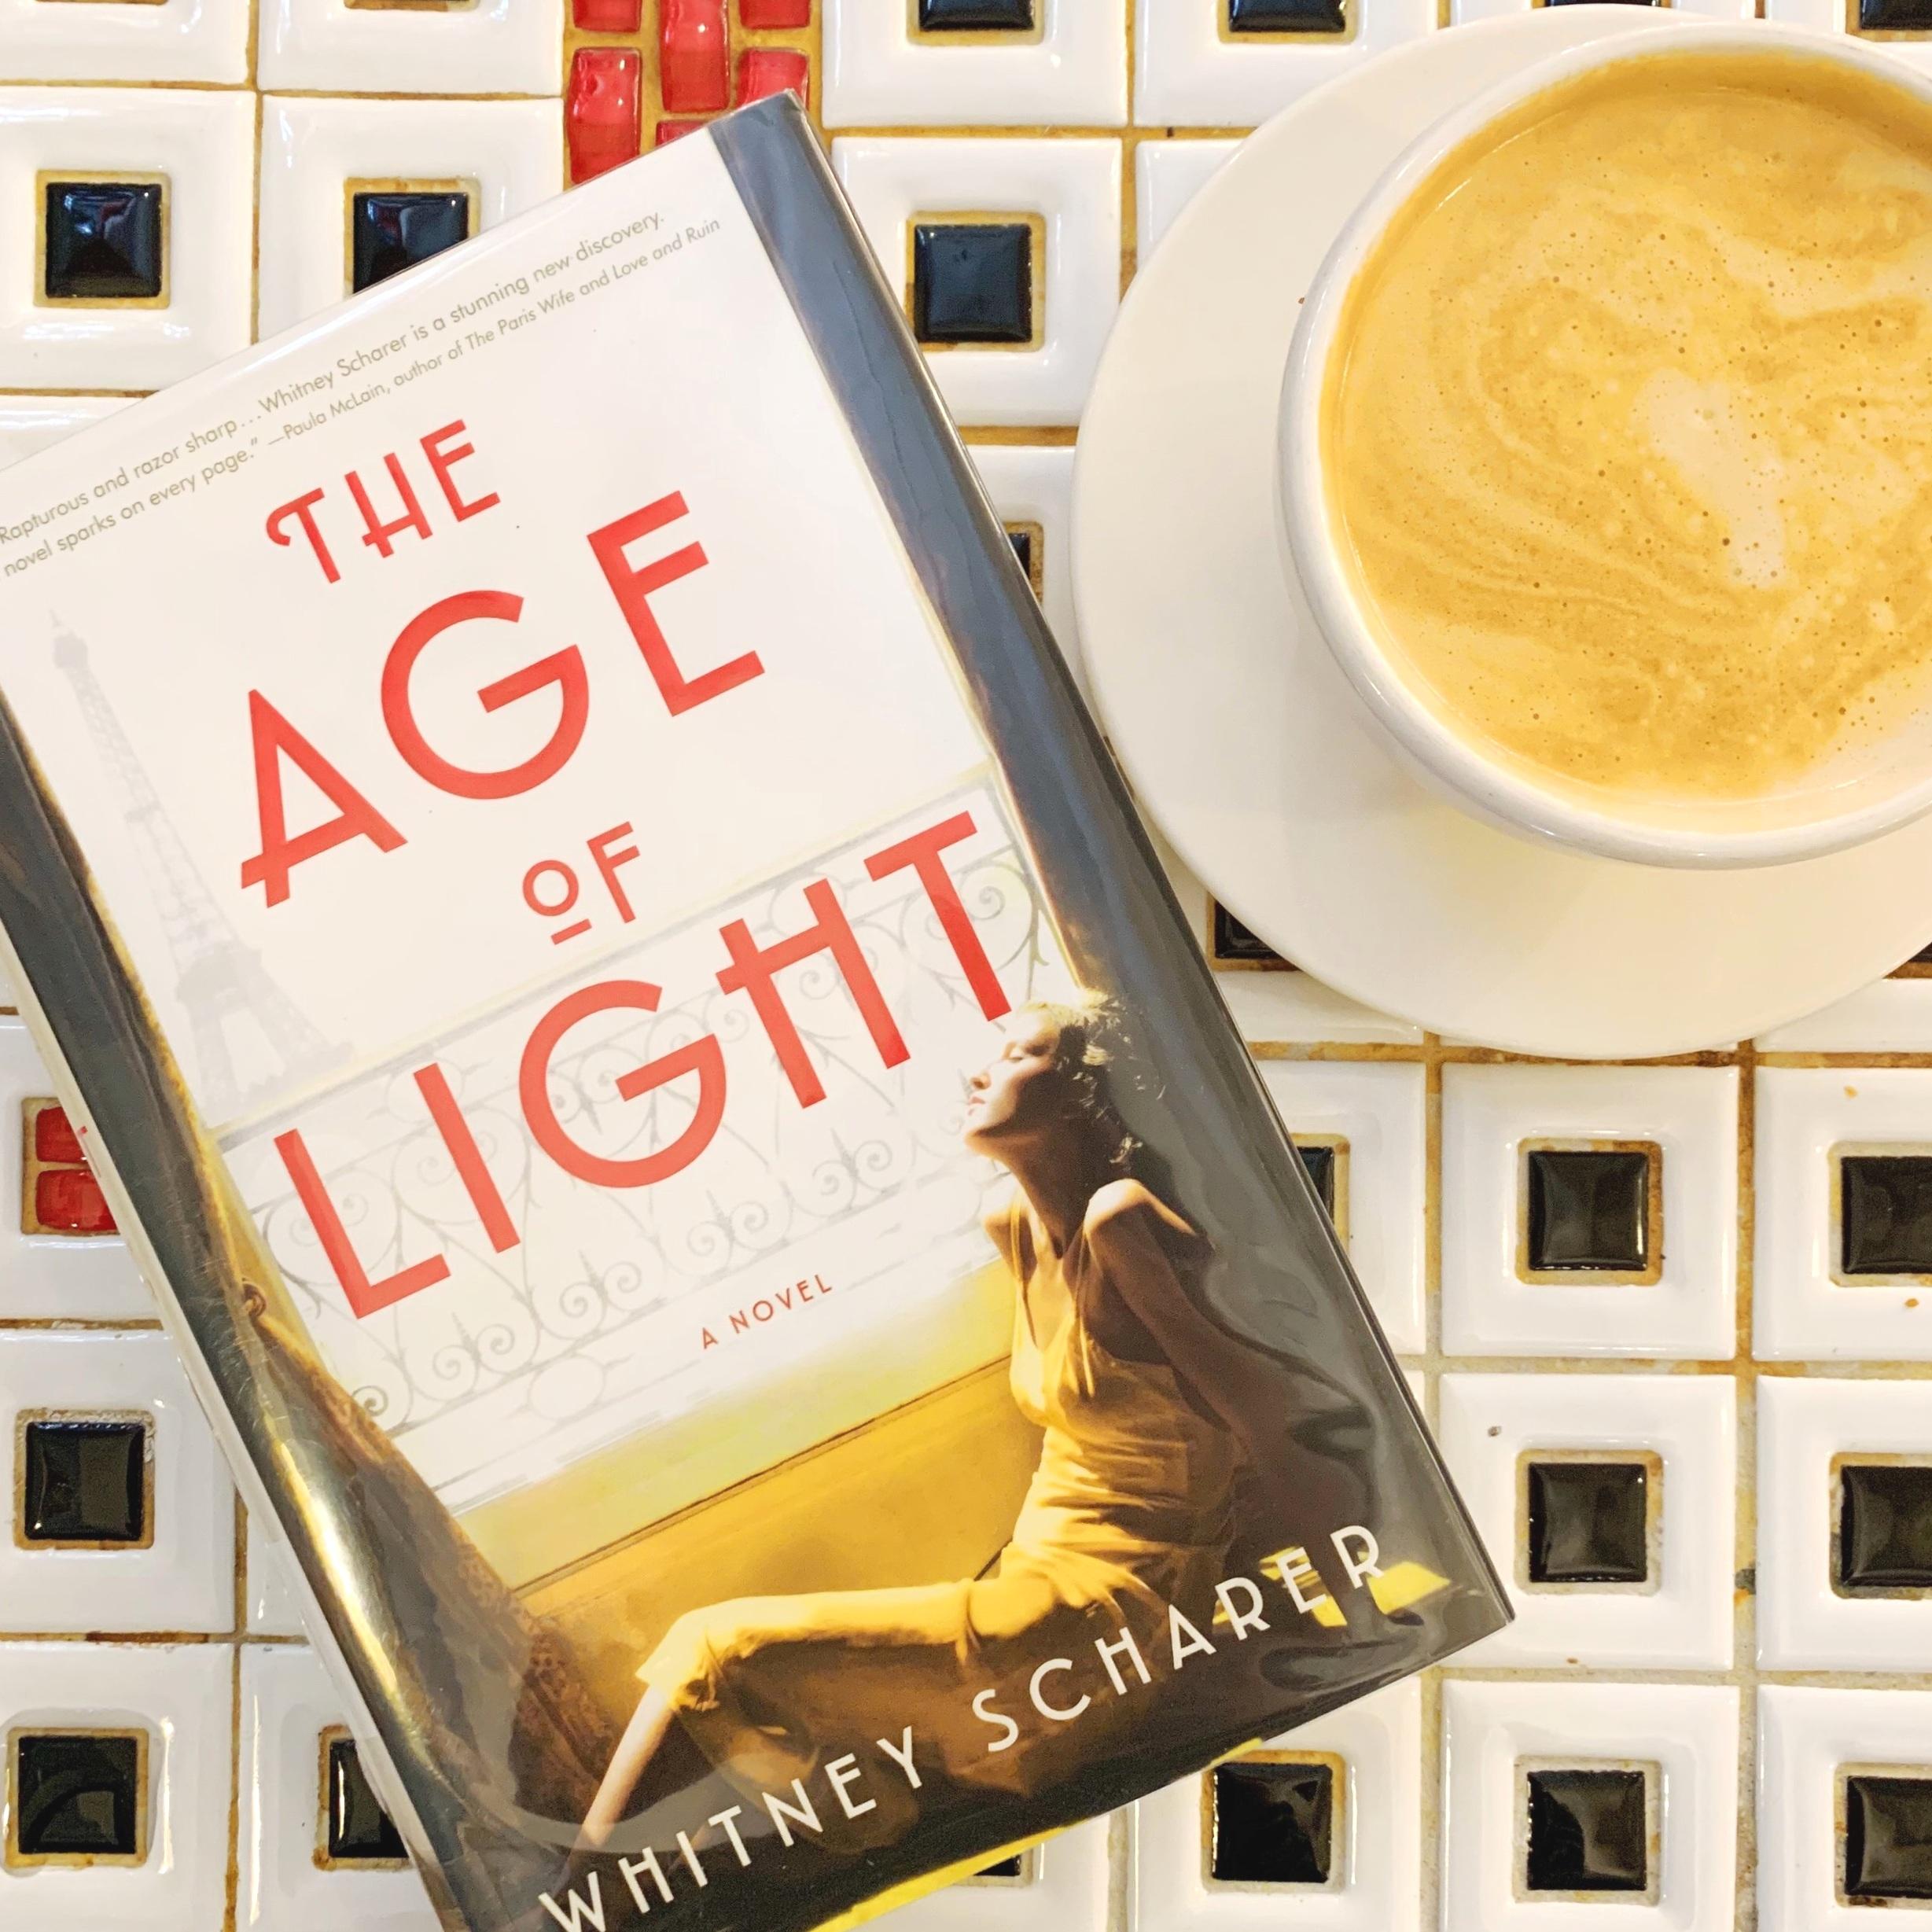 ageoflight_book.jpg